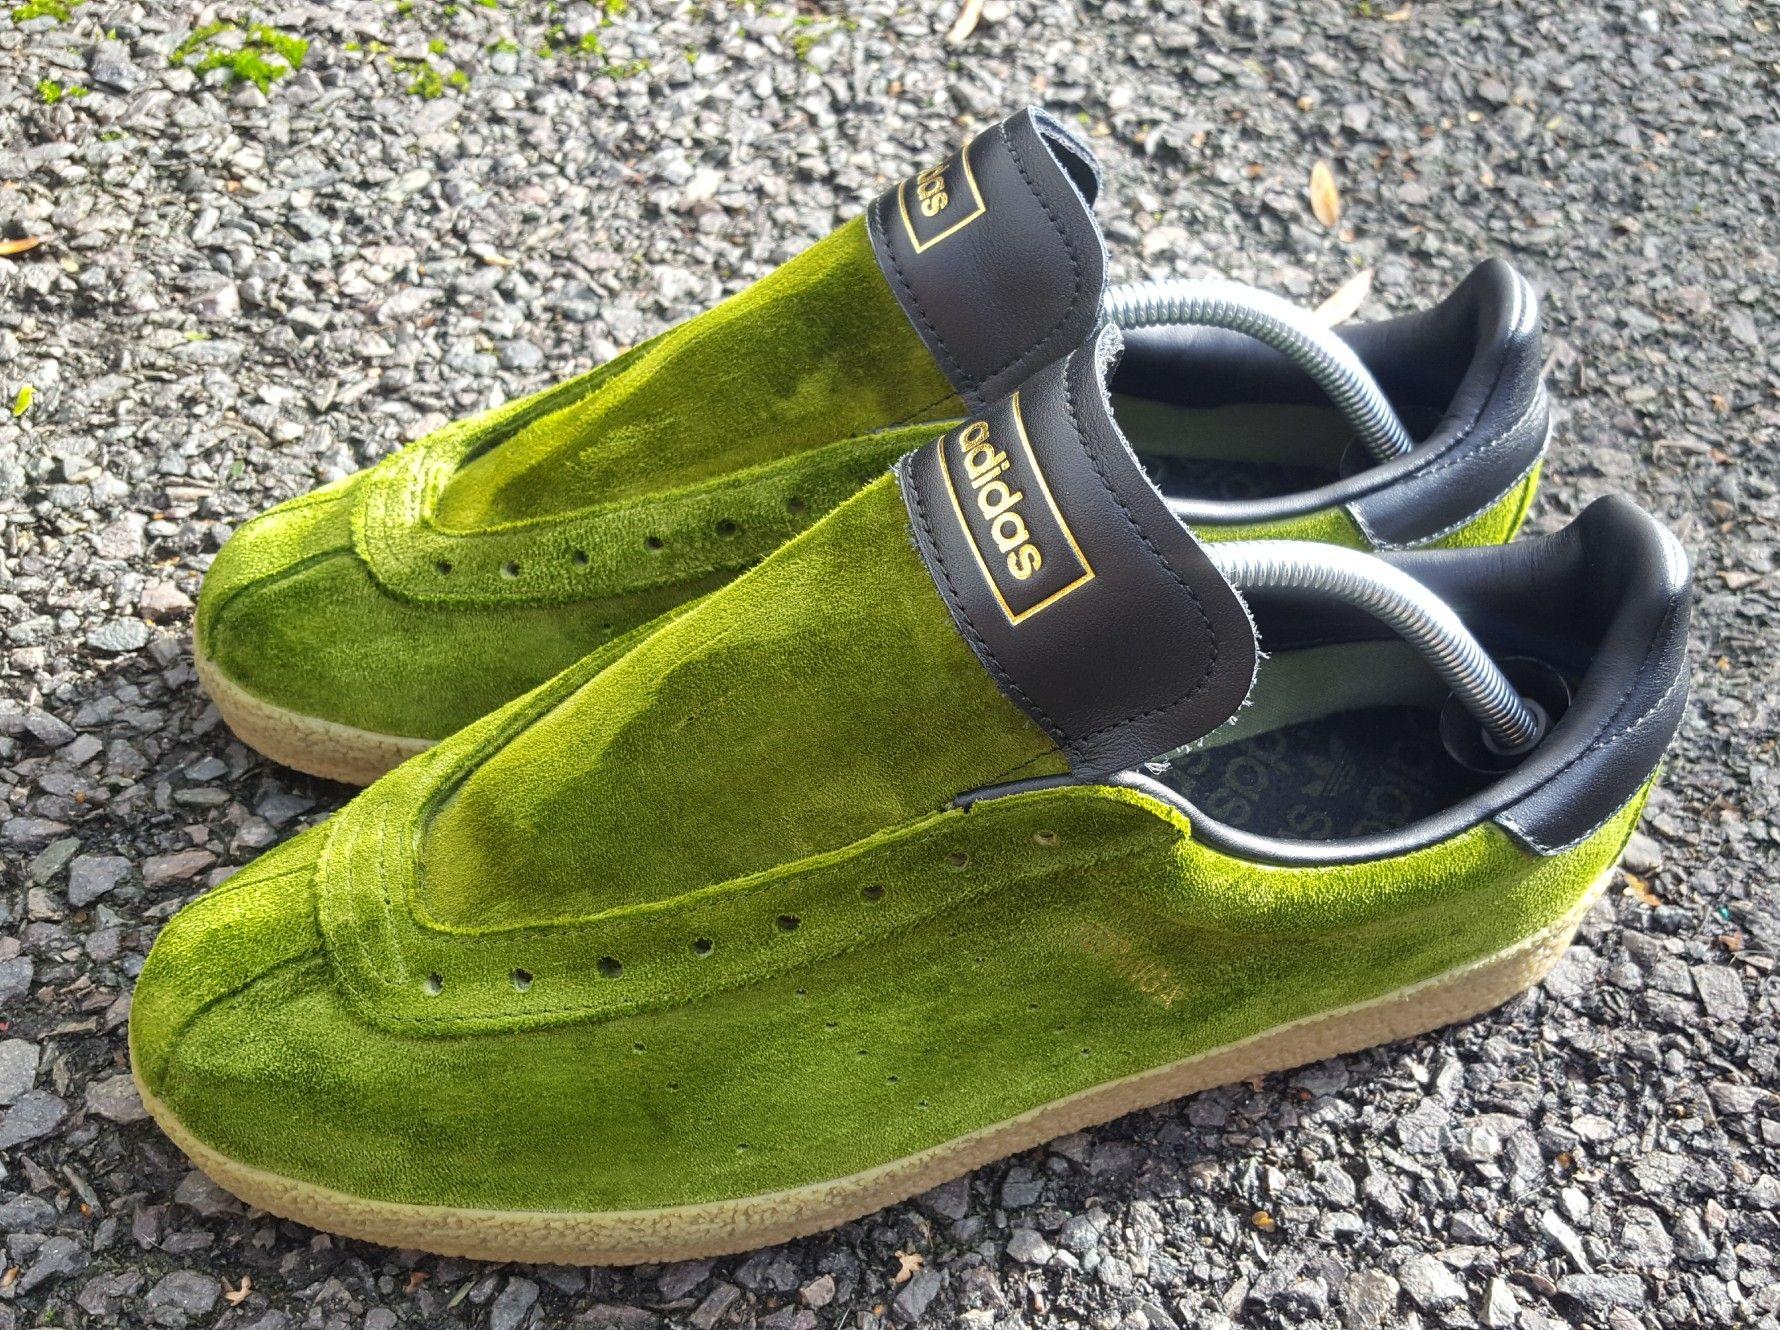 online store 6ede5 2ffcb Green Adidas topanga clean re-dye with ardwick green